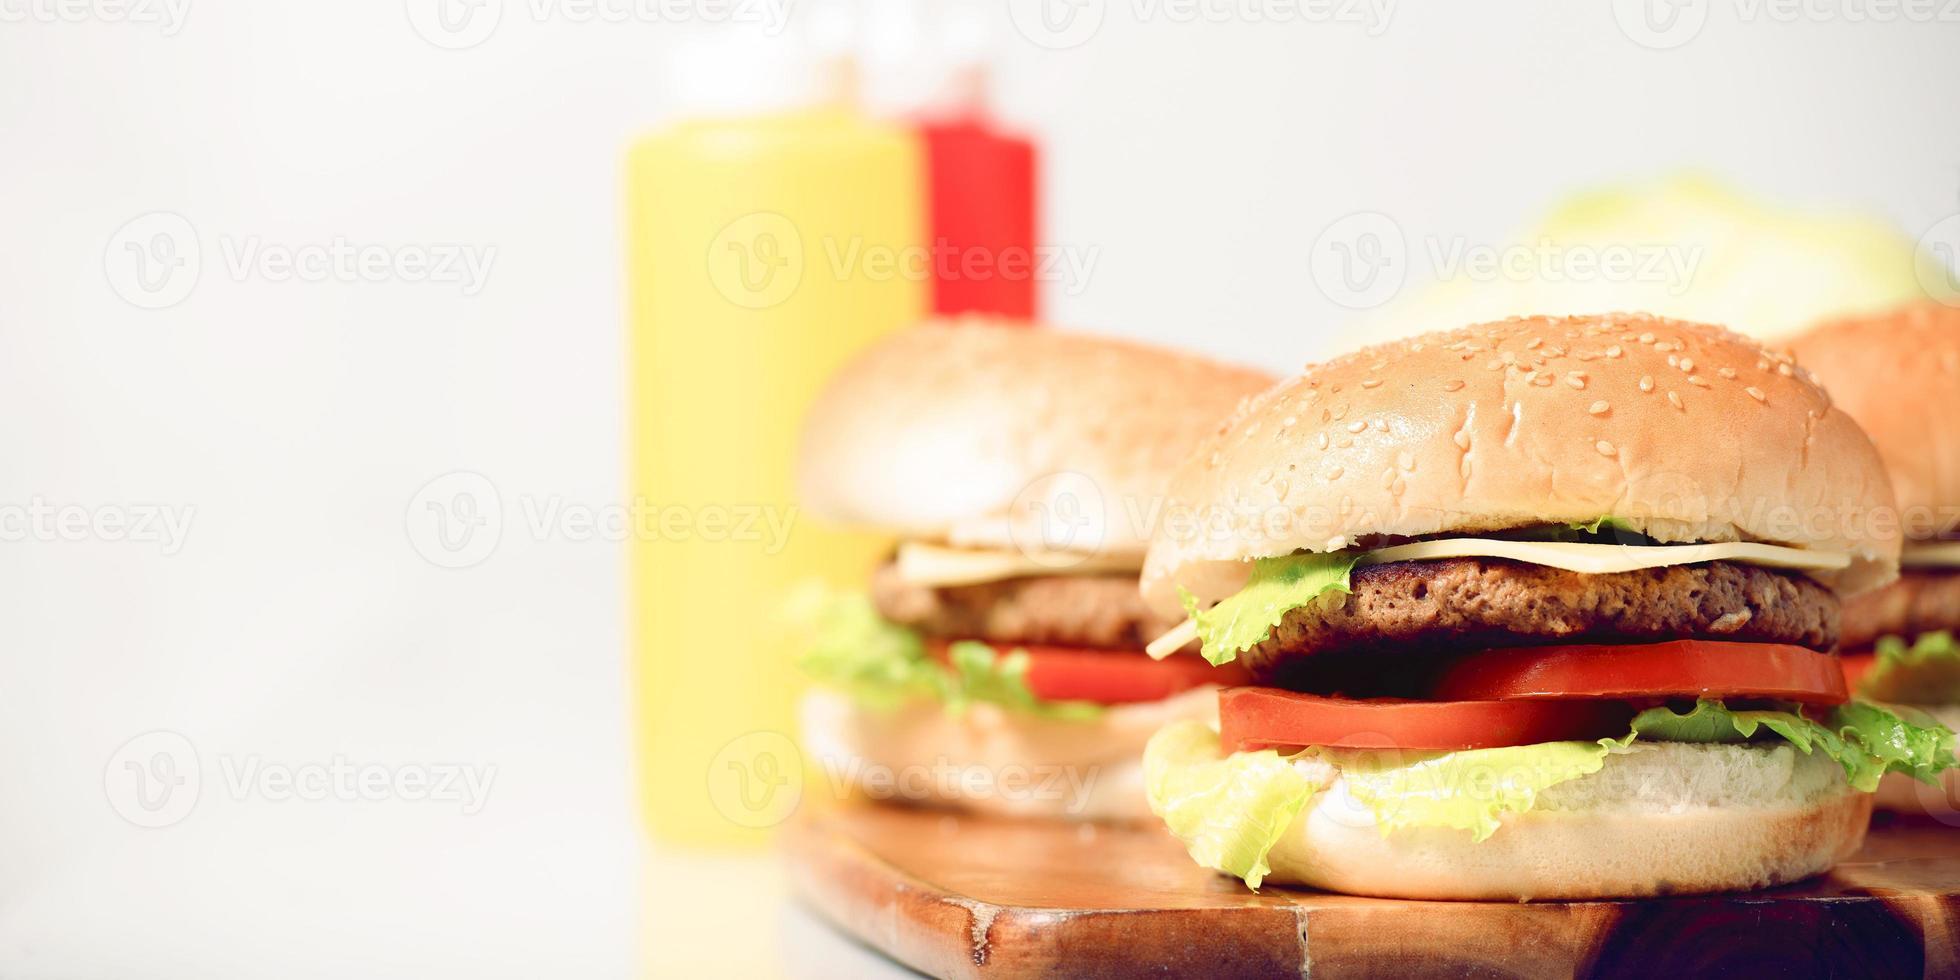 klassische Hamburger mit Käse foto